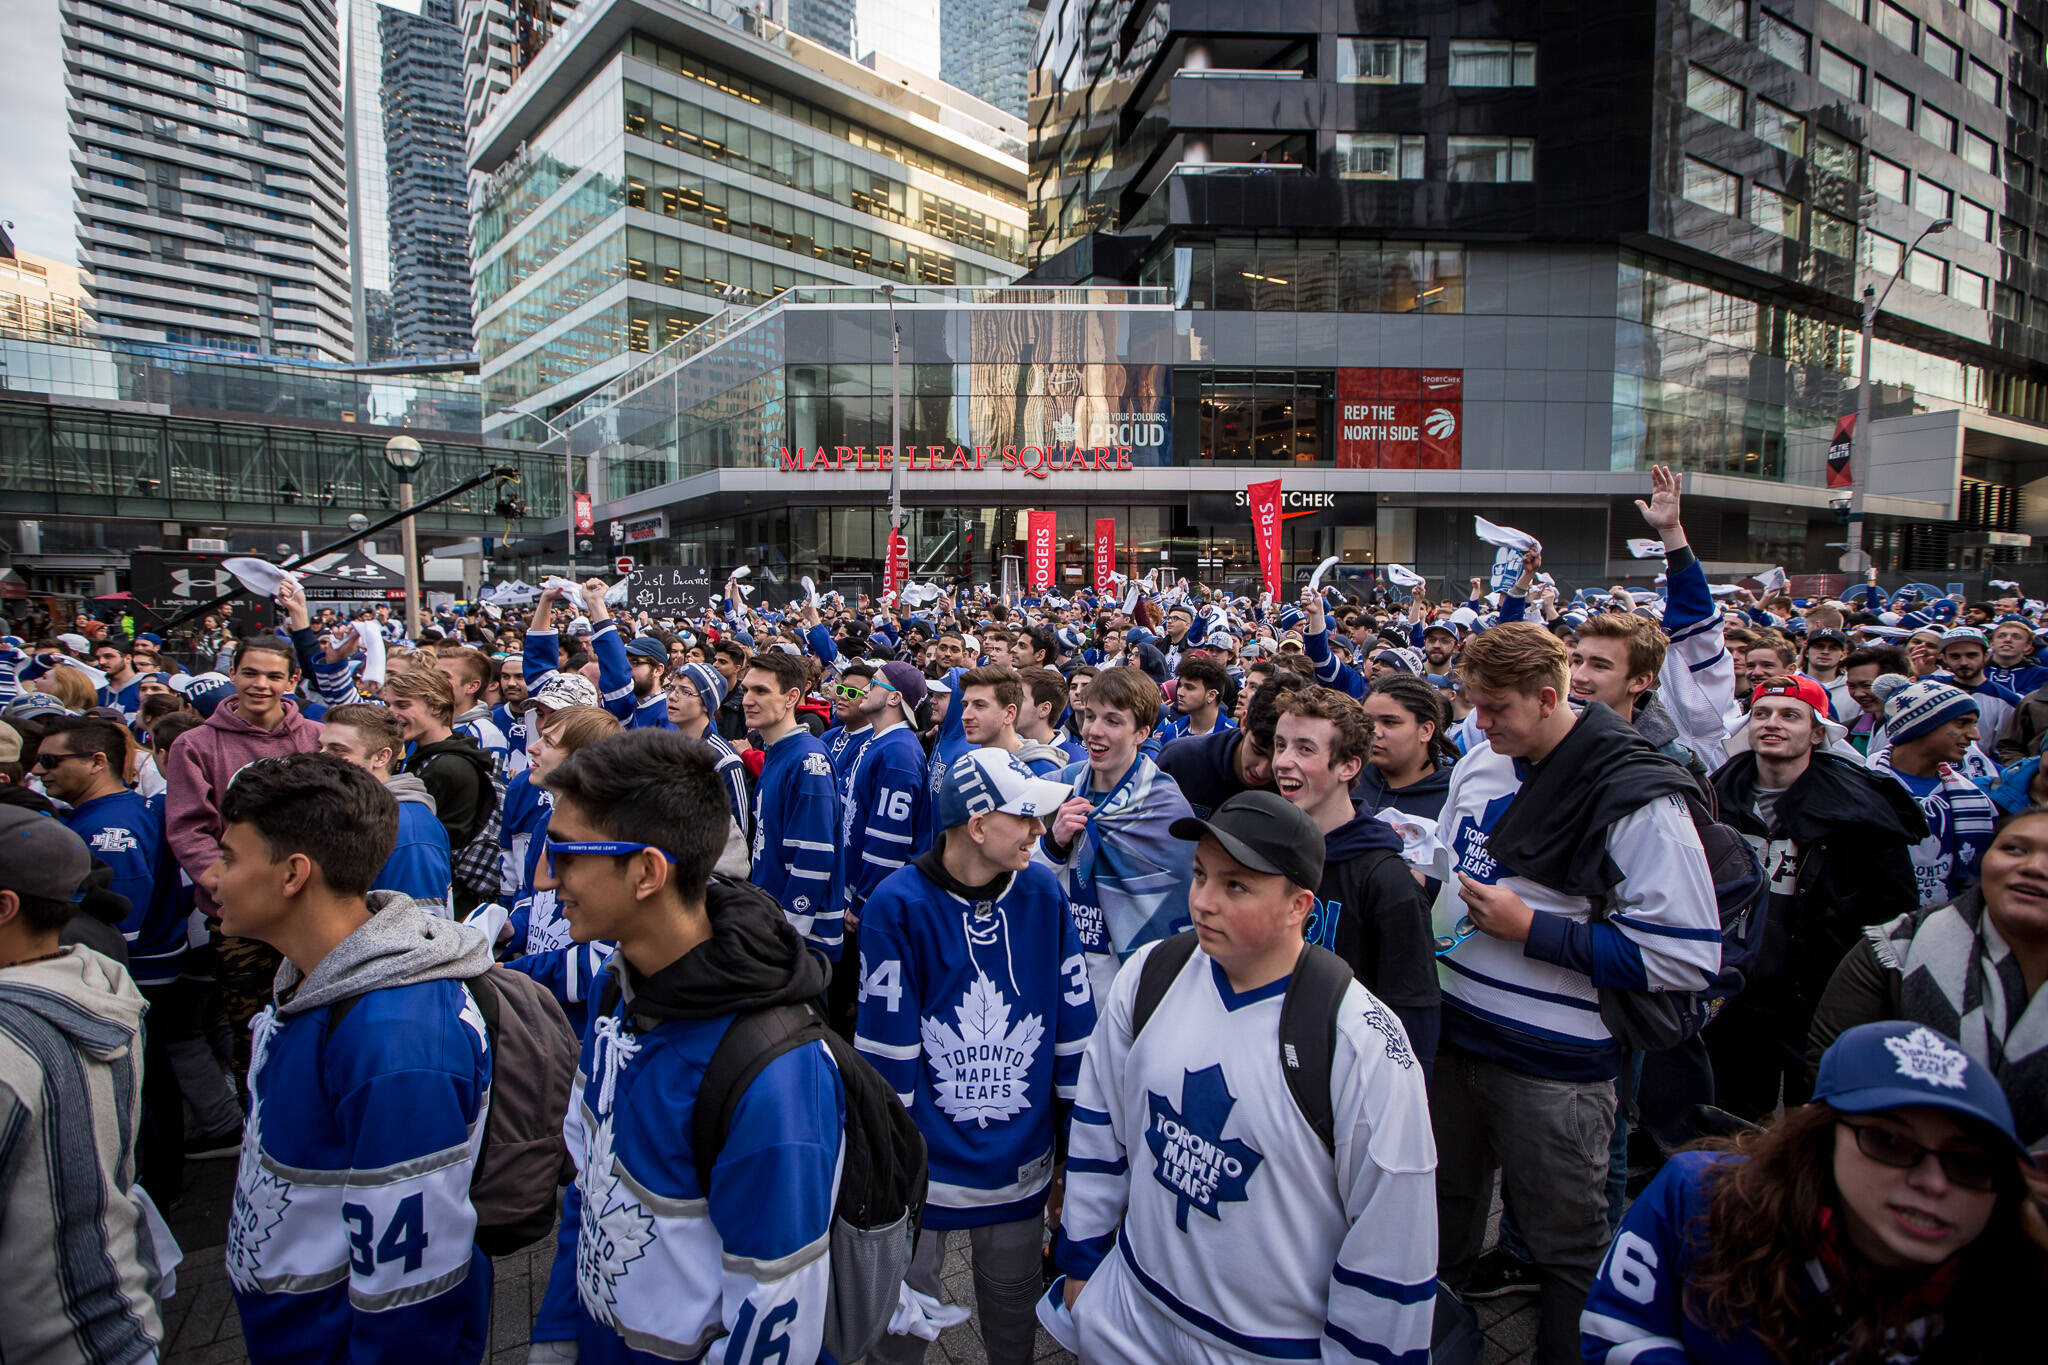 Toronto Road Closure